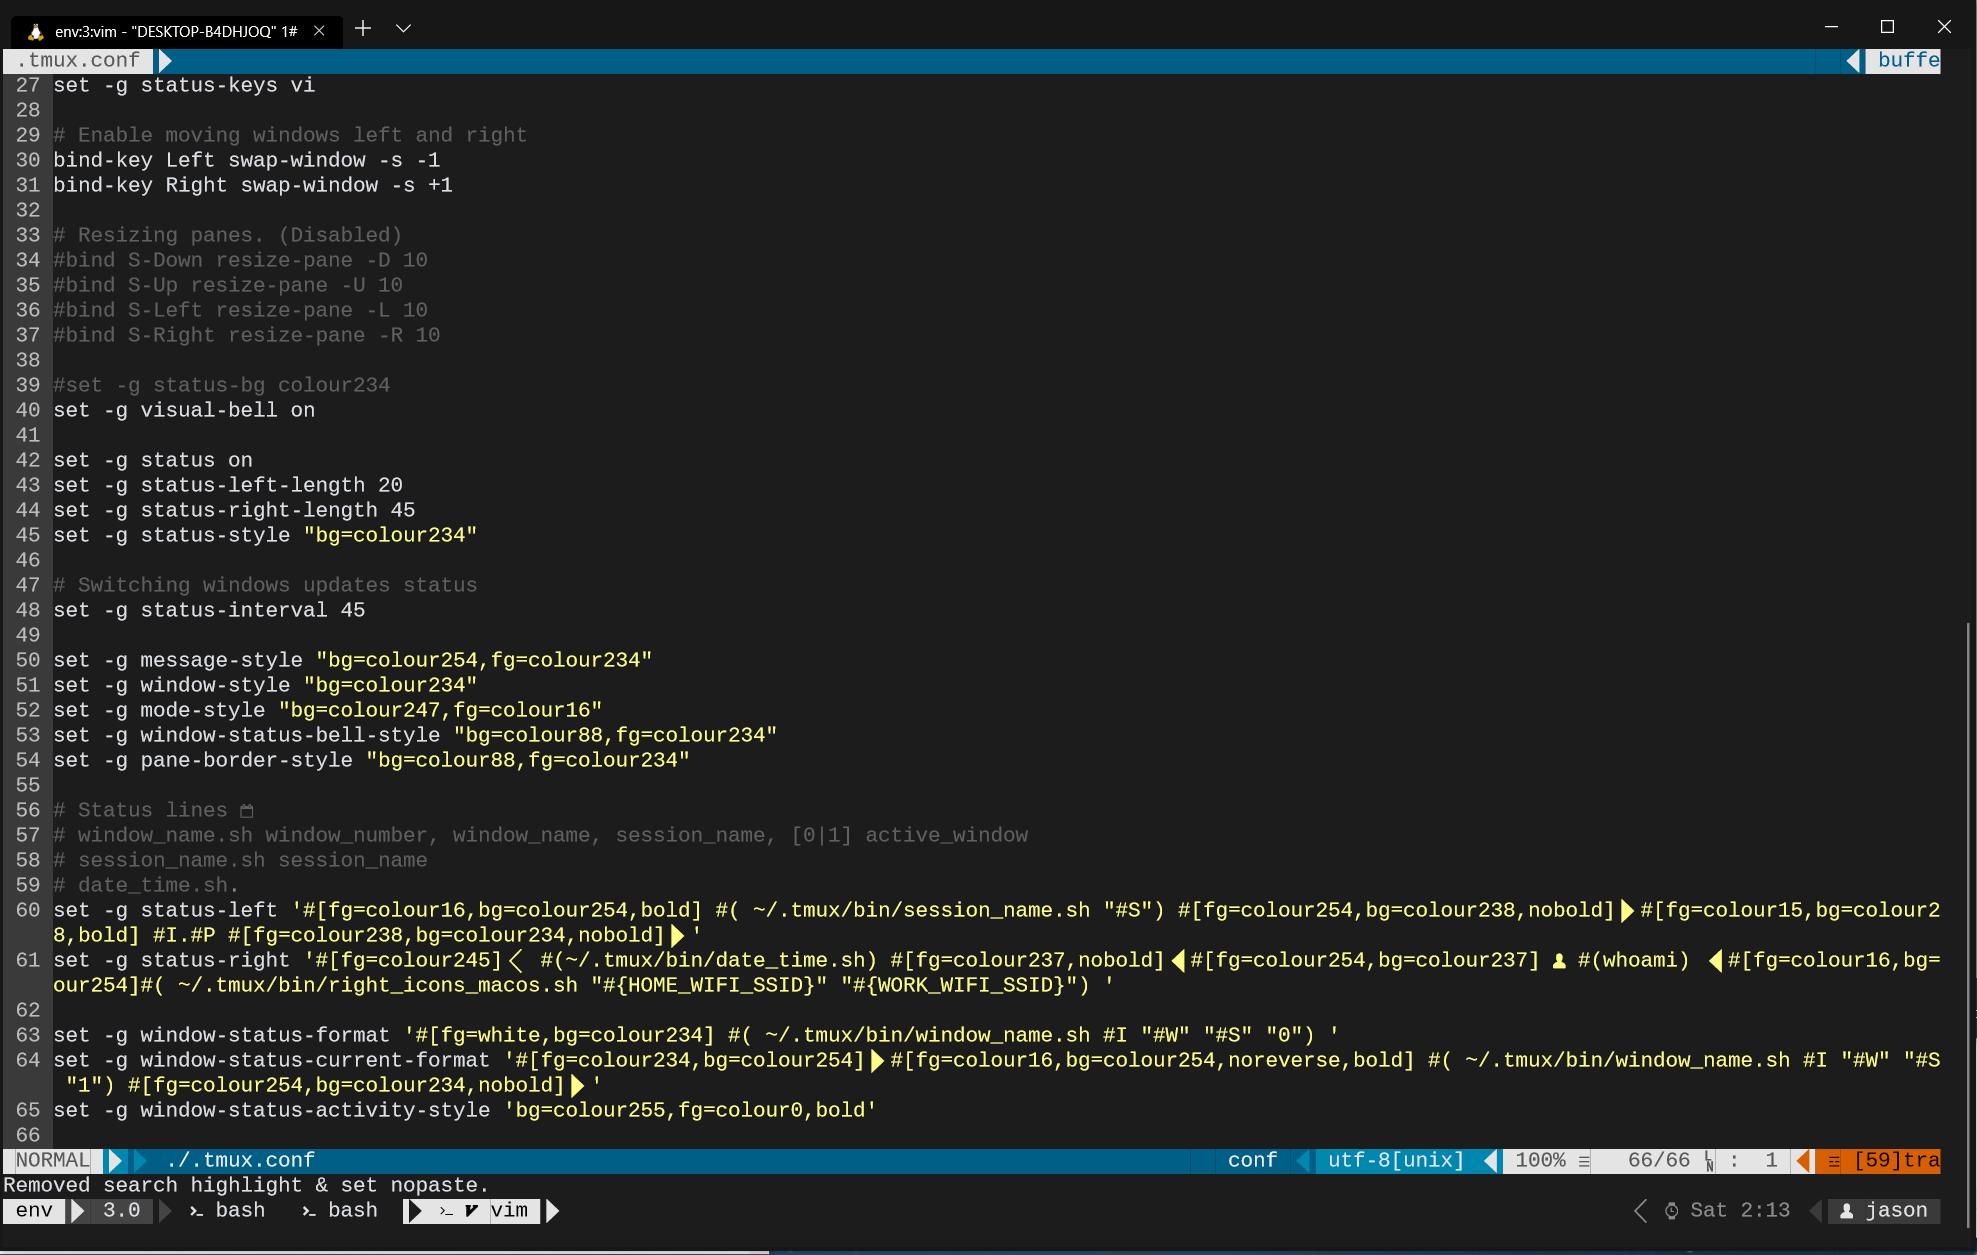 WSL terminal crashes when using tmux · Issue #2610